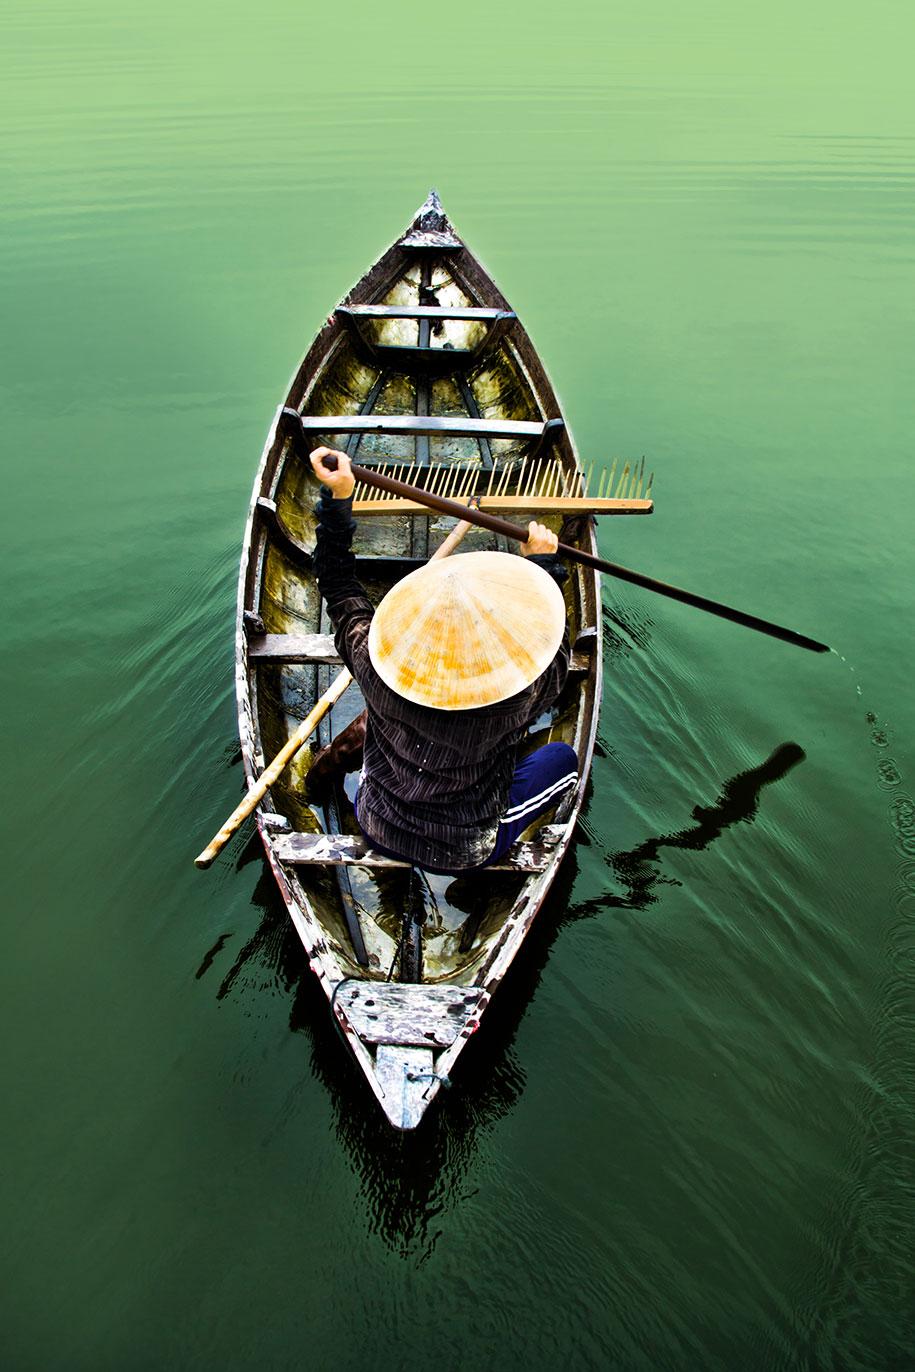 historical-asian-port-photography-hoi-an-rehahn-croquevielle-vietnam-15